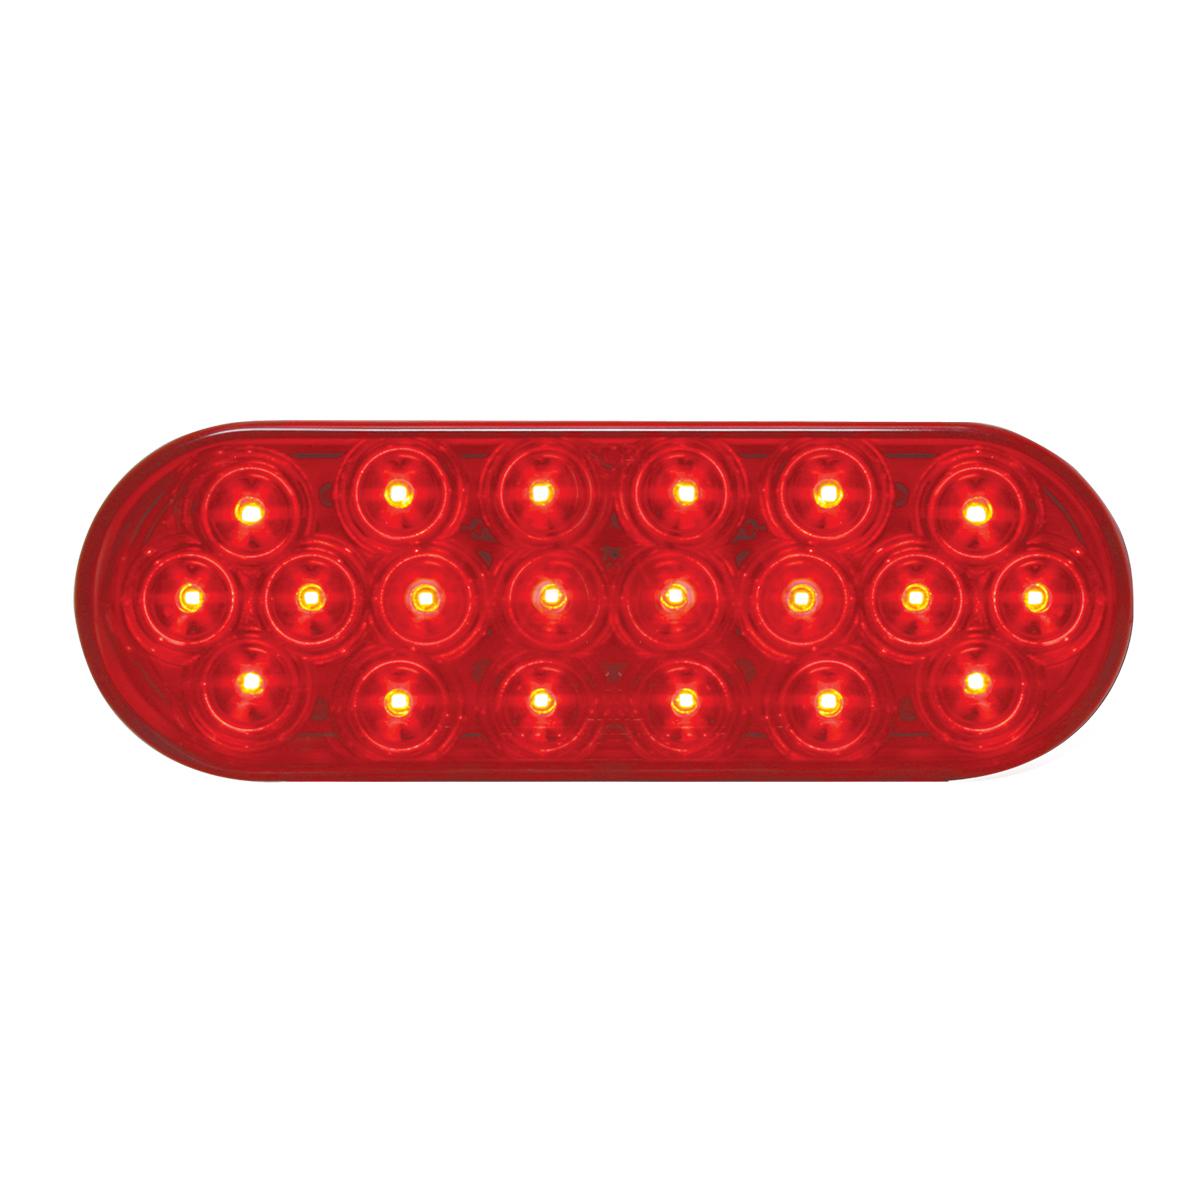 #87721 Fleet LED Red/Red - Flat